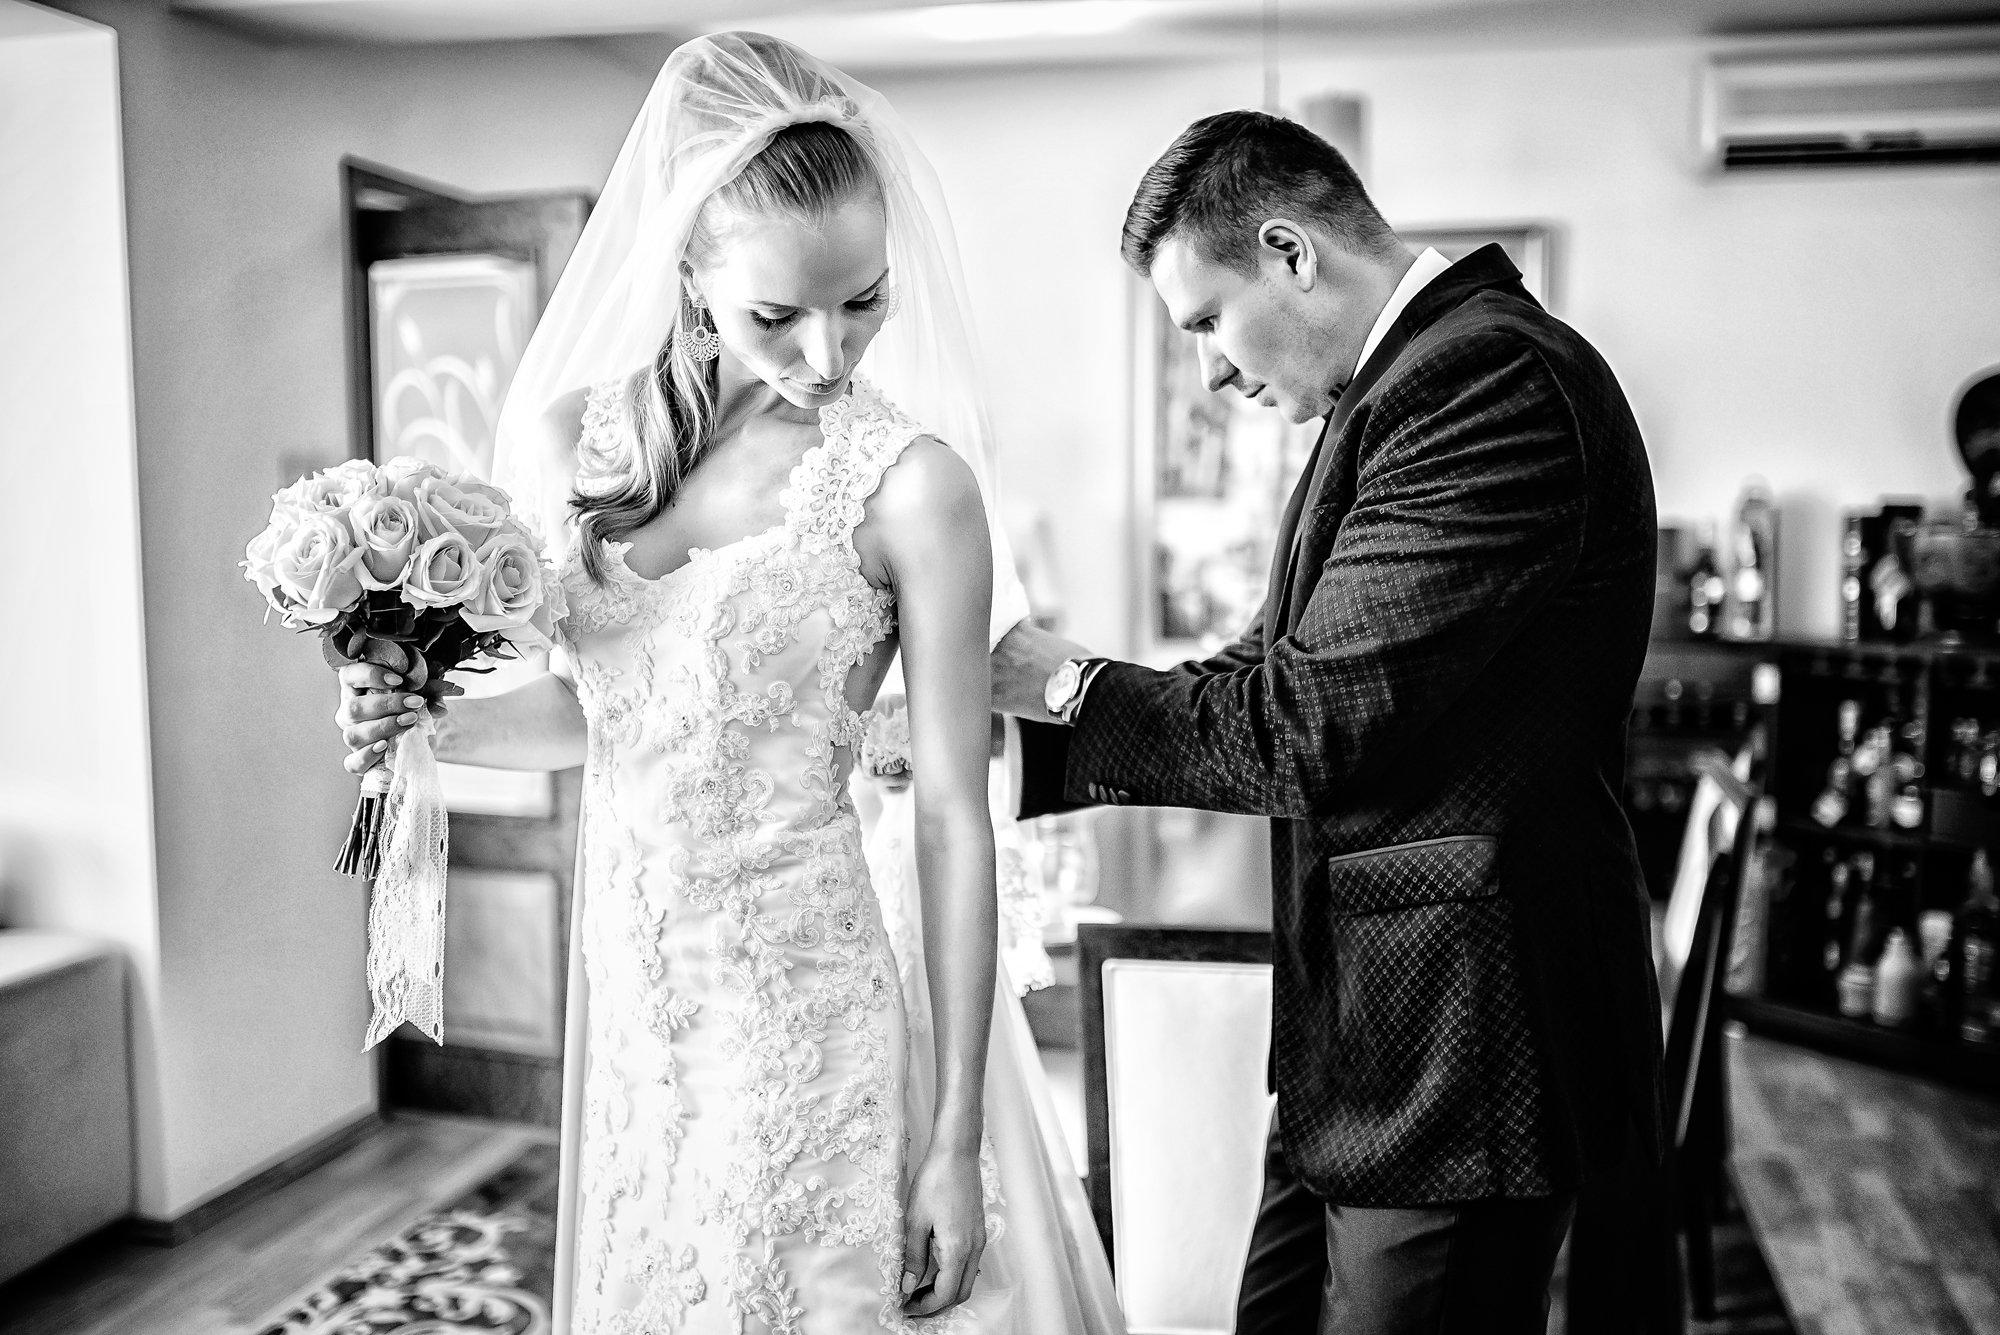 alexandru madalina wedding day 10 1